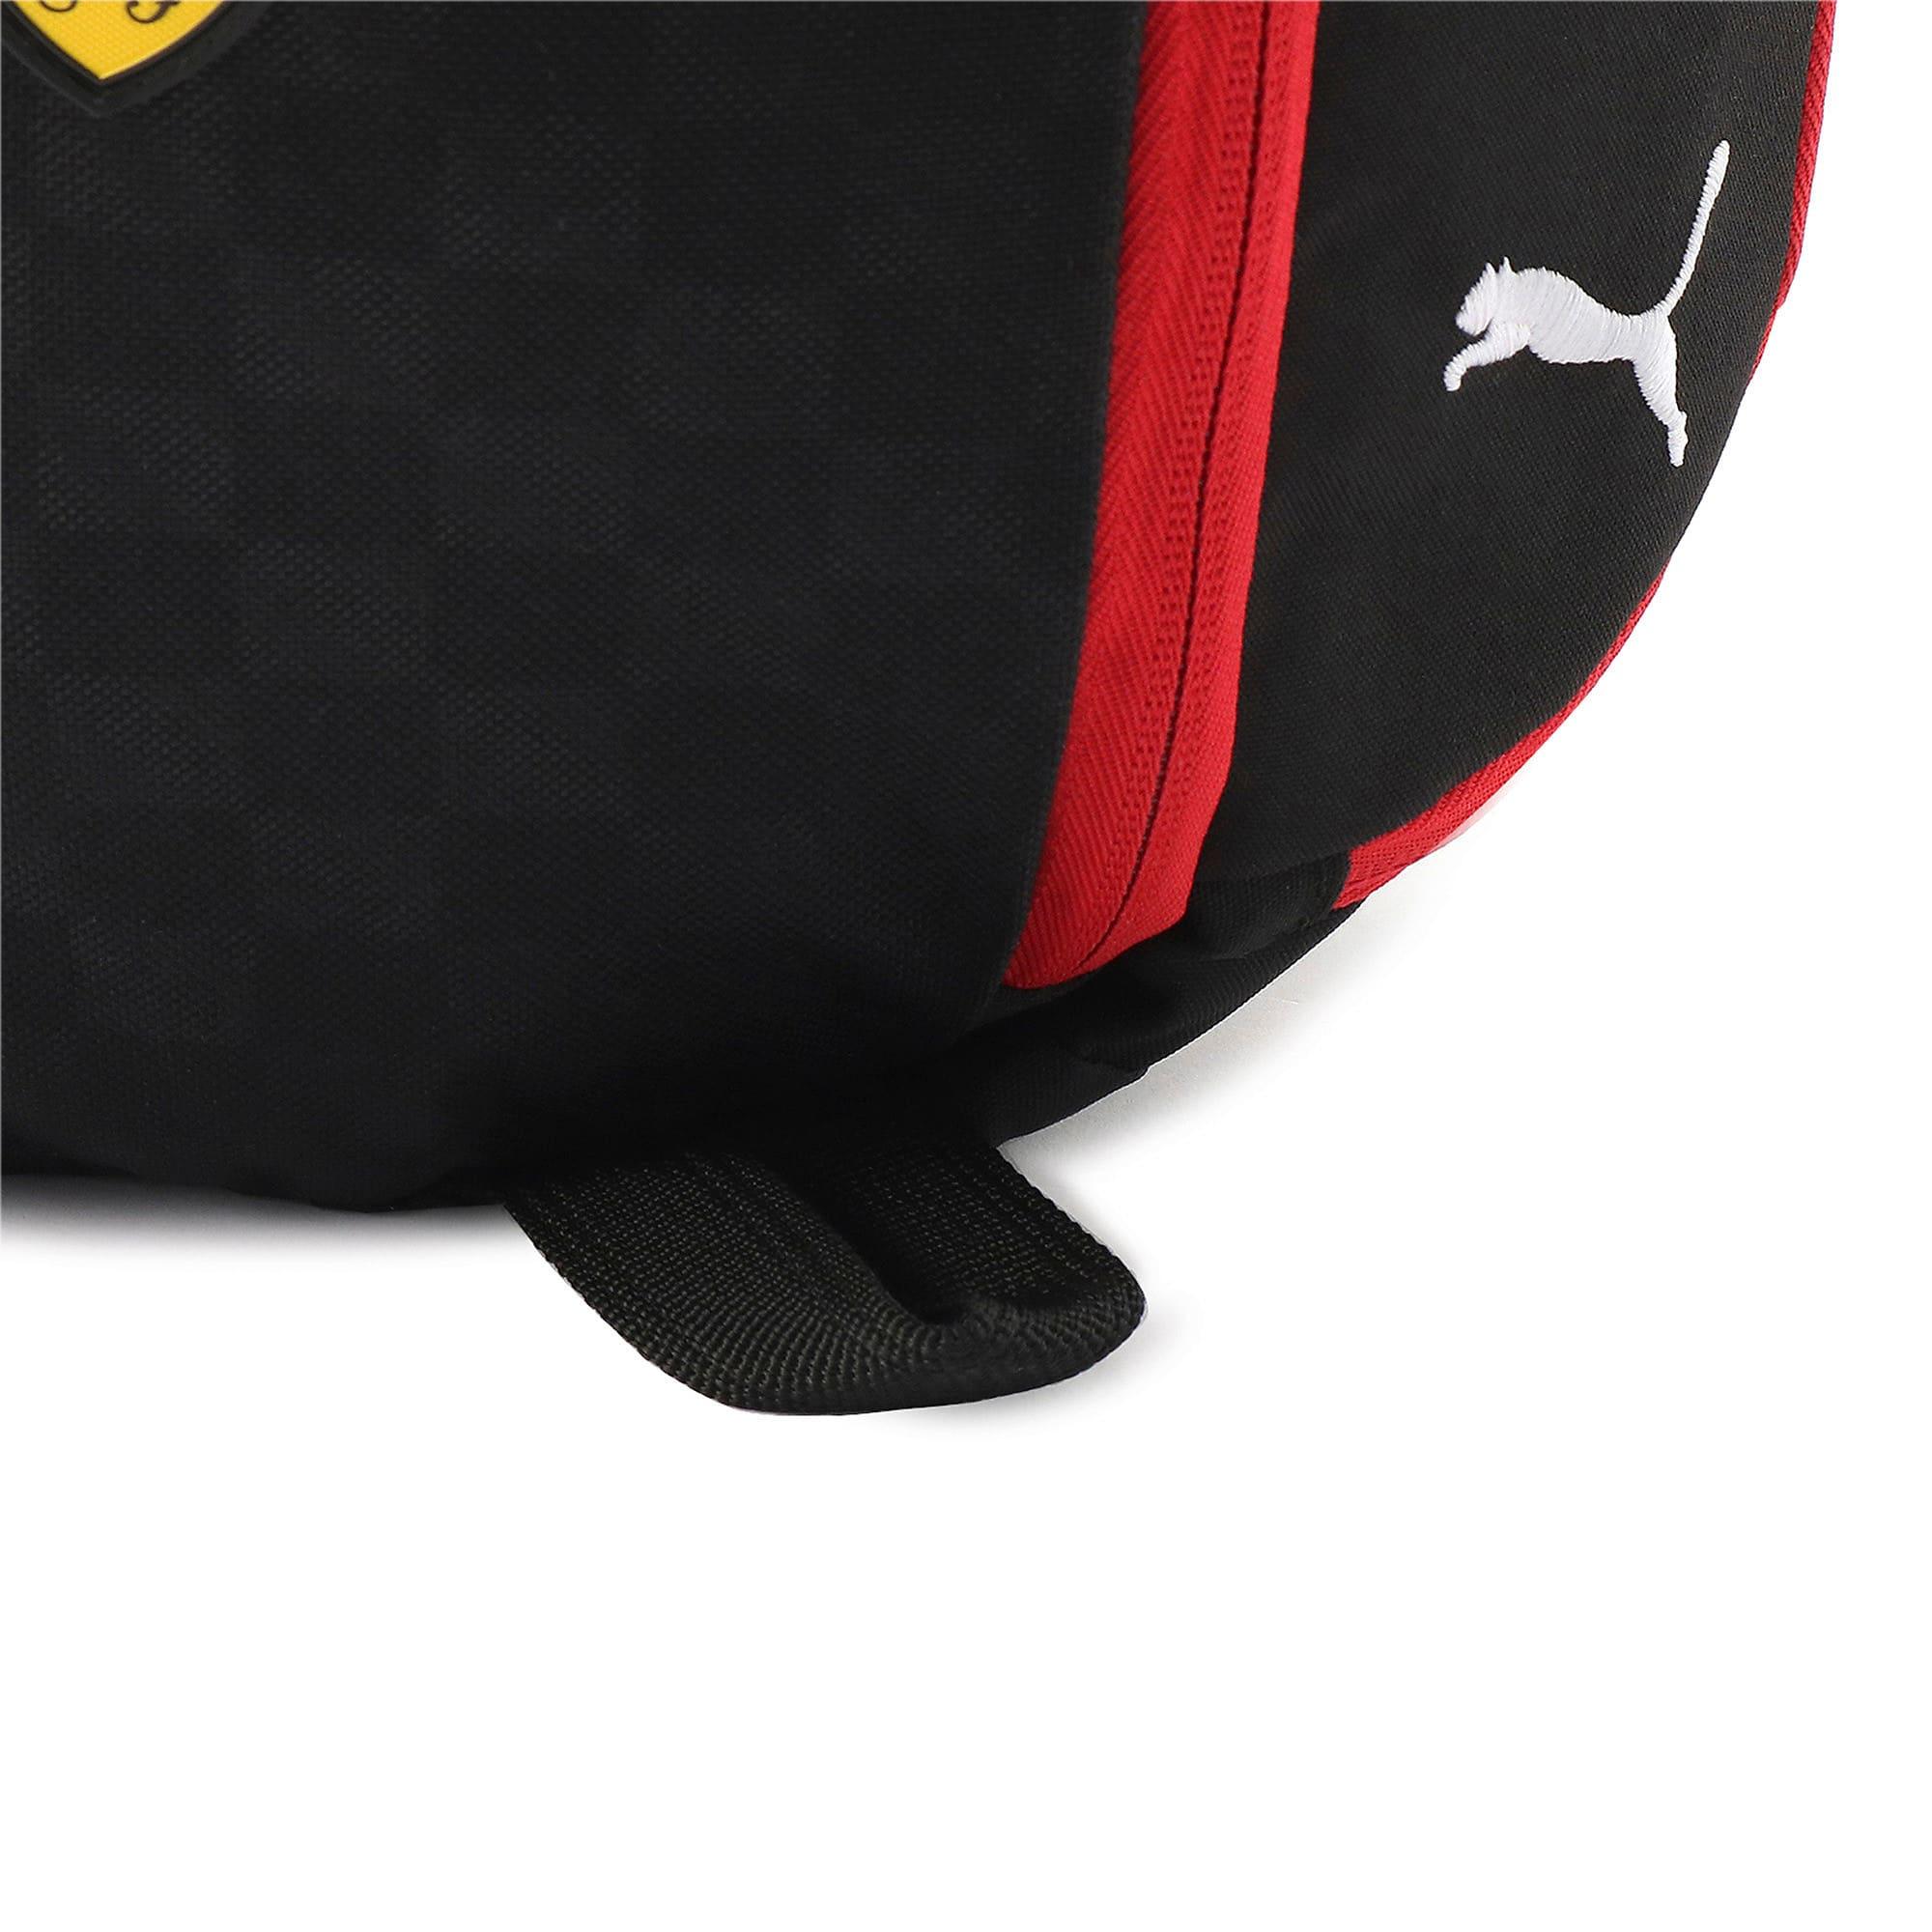 Thumbnail 12 of フェラーリ ファンウェア シリング バッグ 7L, Puma Black-Rosso Corsa, medium-JPN